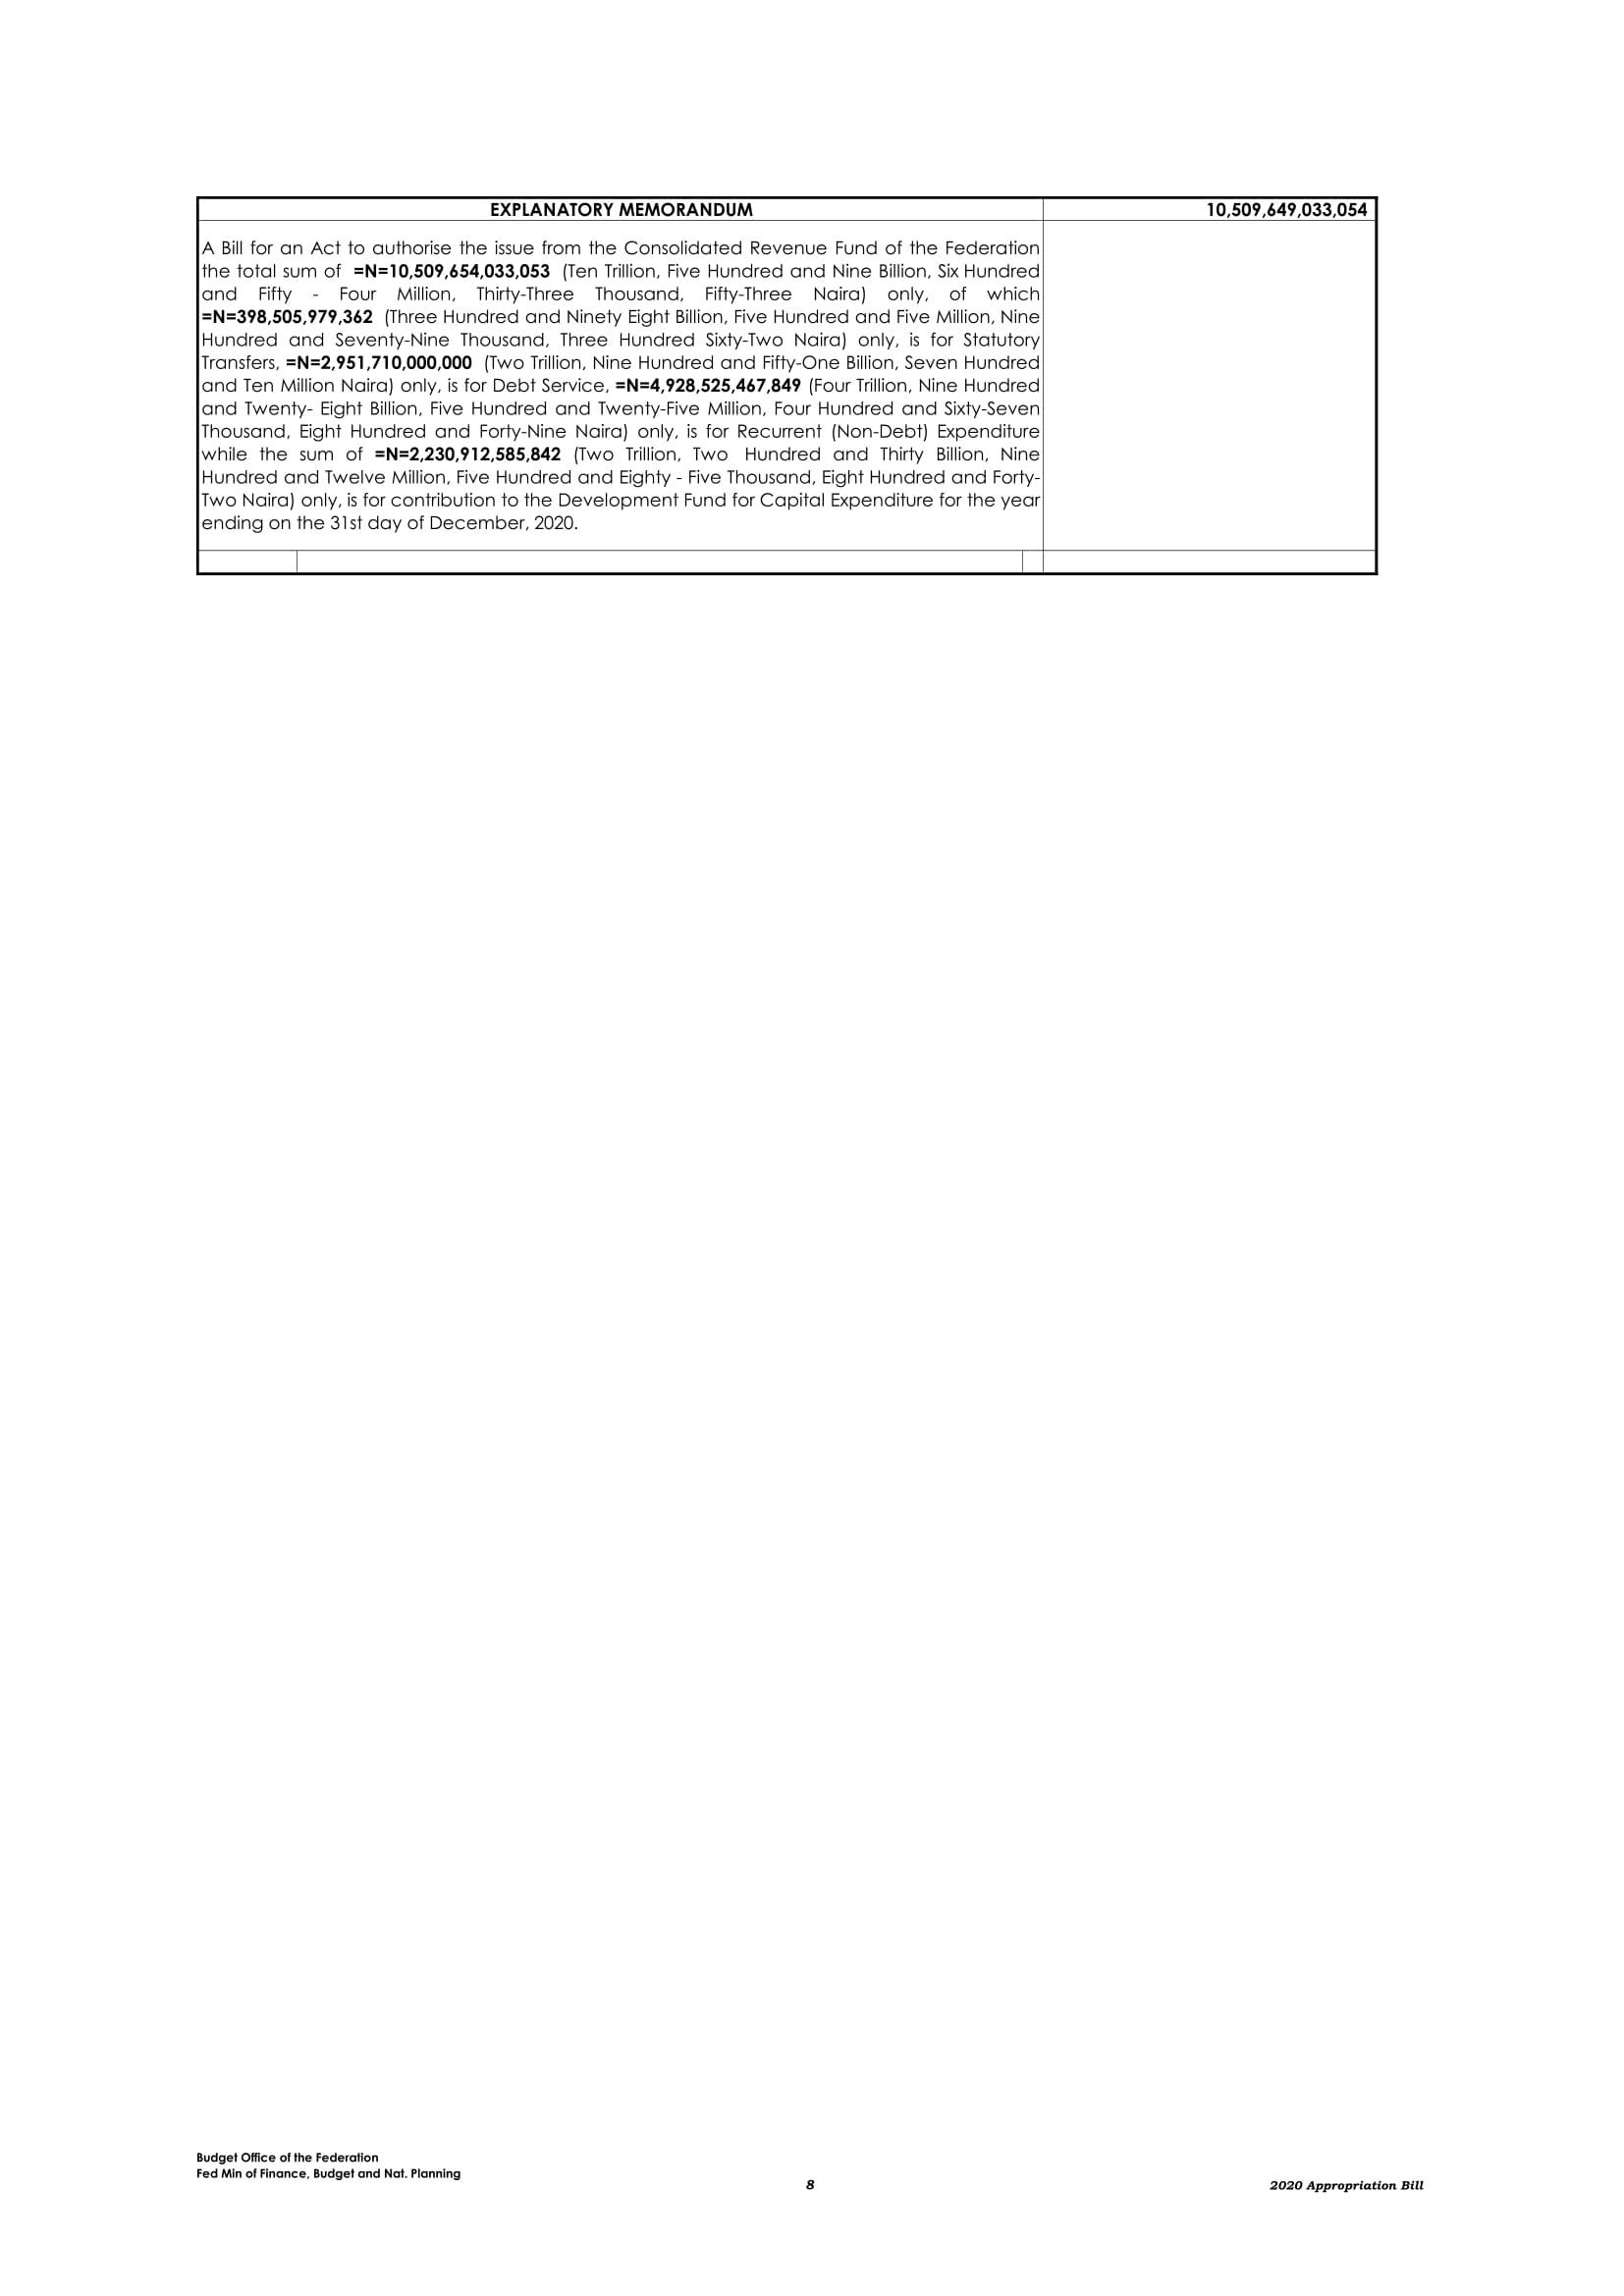 2020 Revised Appropriation Bill 8